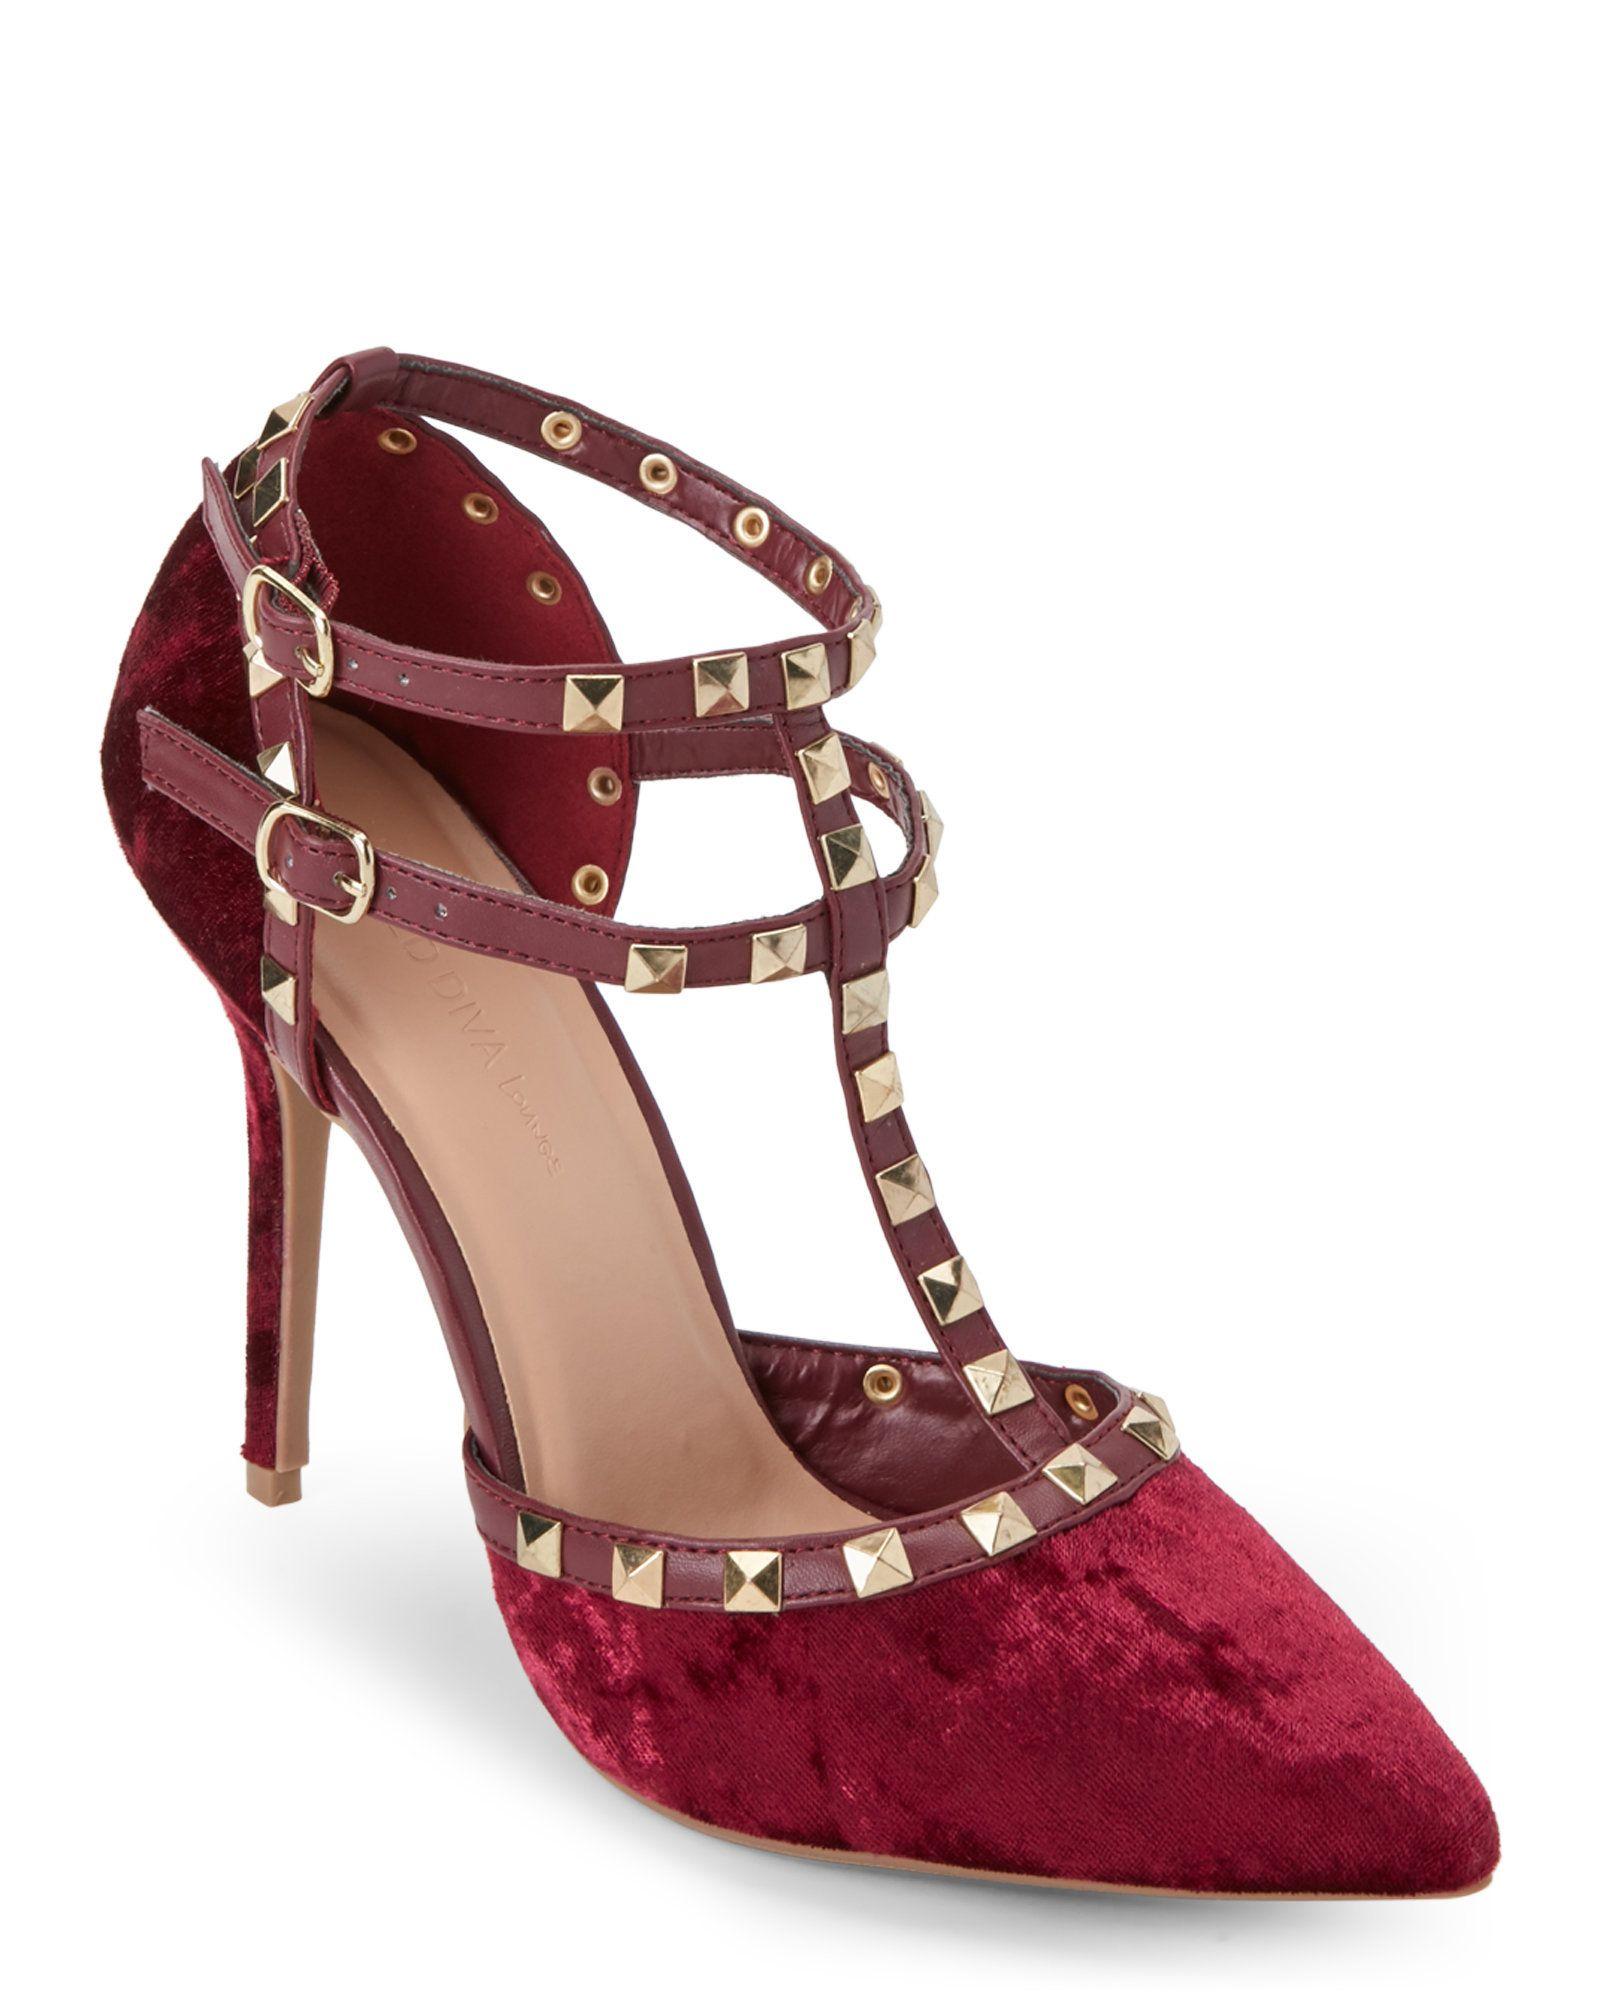 73ef2eb8257 Burgundy Adora Studded T-Strap Velvet Pumps | My Favorite High Heels ...